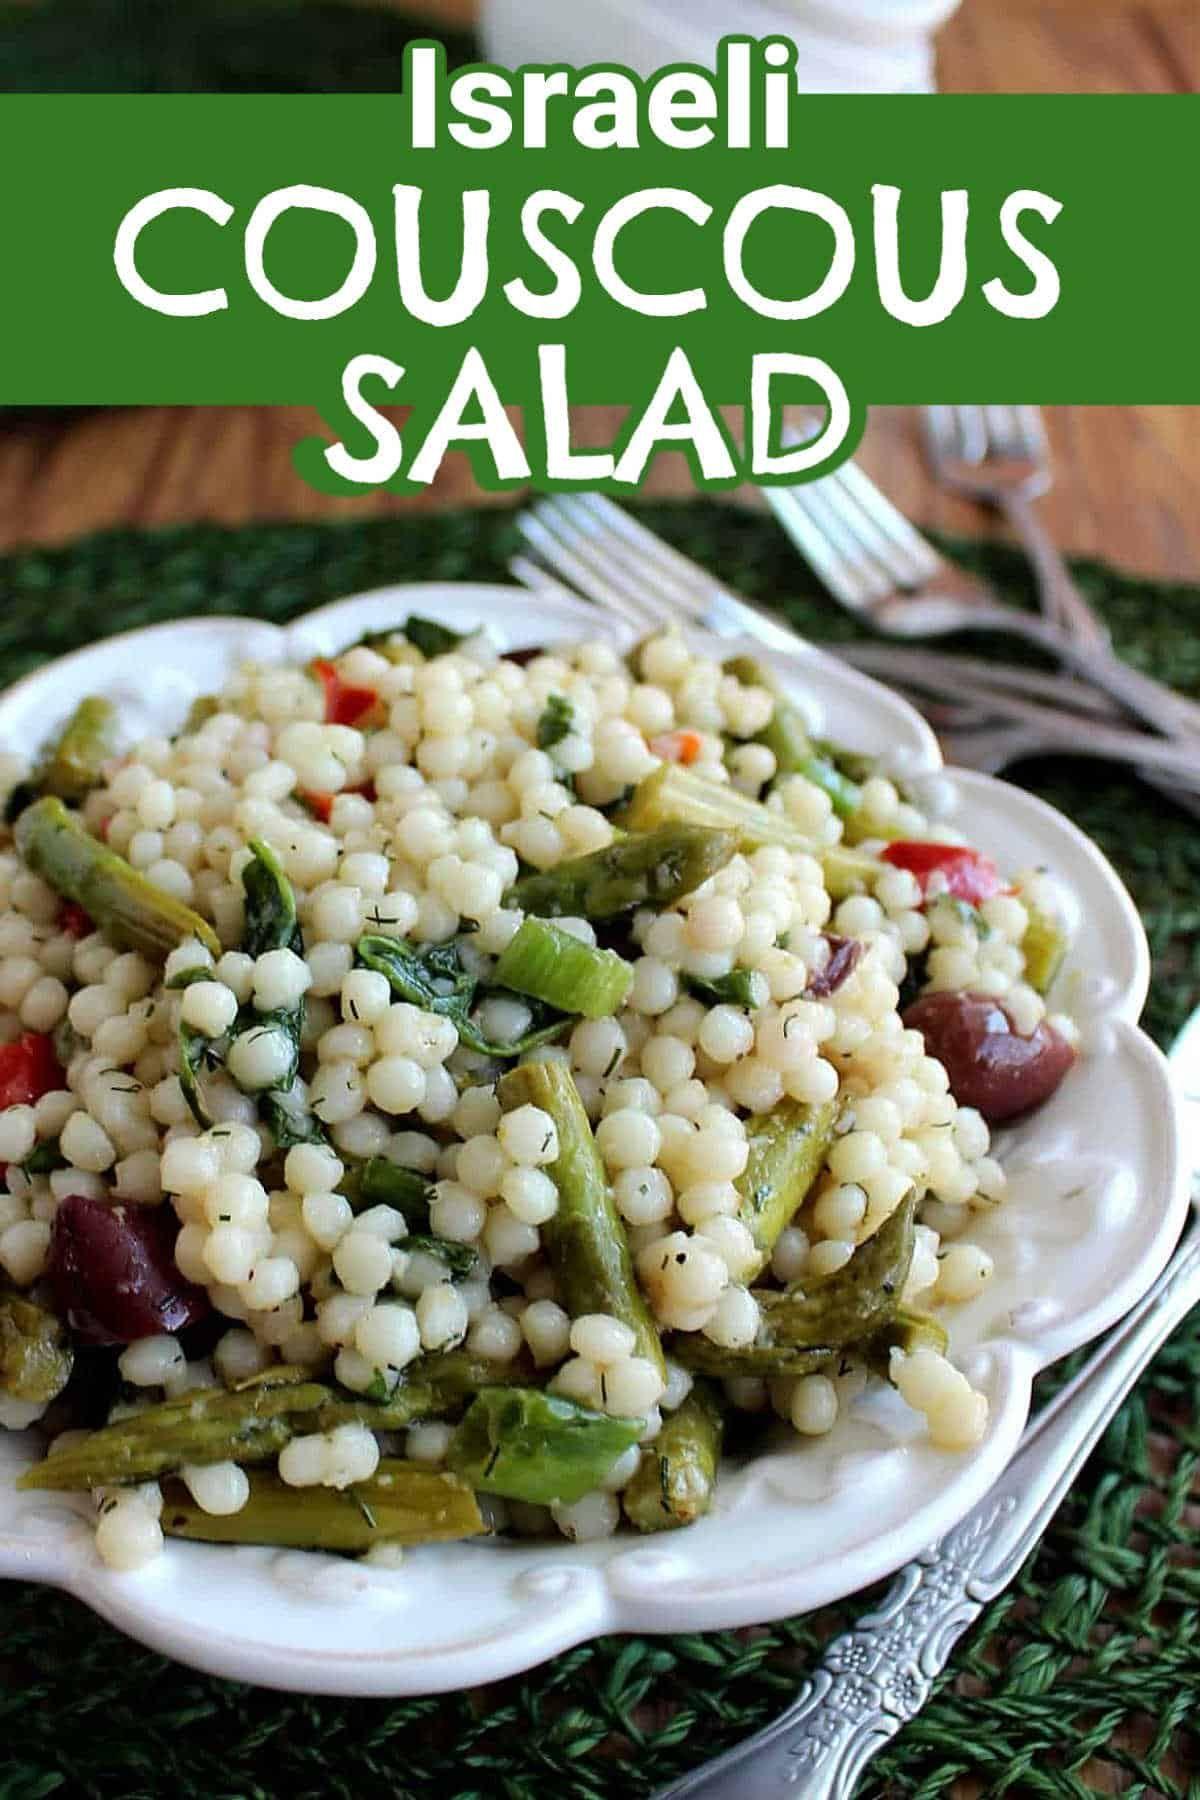 Pearl Couscous Salad Video Healthy Recipes Vegetarian Recipes Couscous